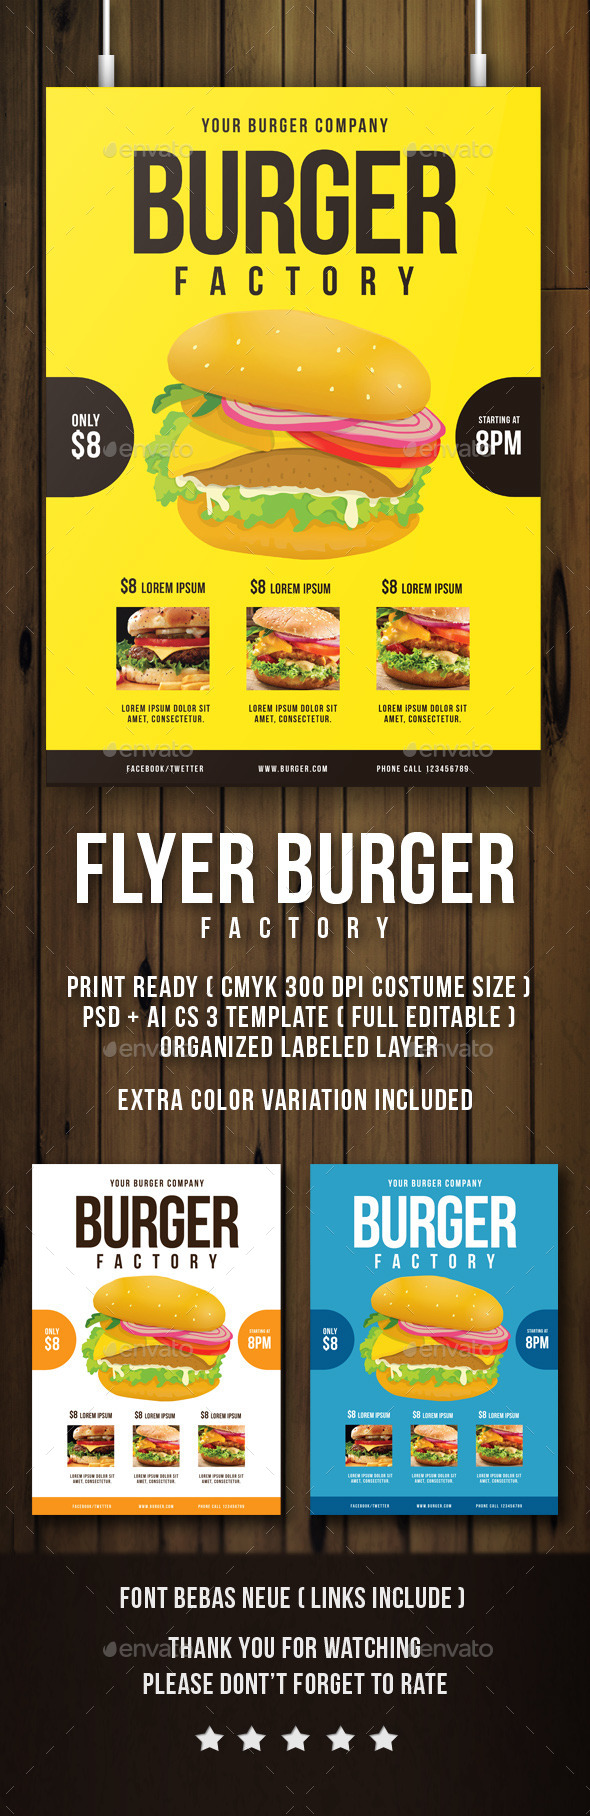 BURGER FACTORY FLYER - Restaurant Flyers